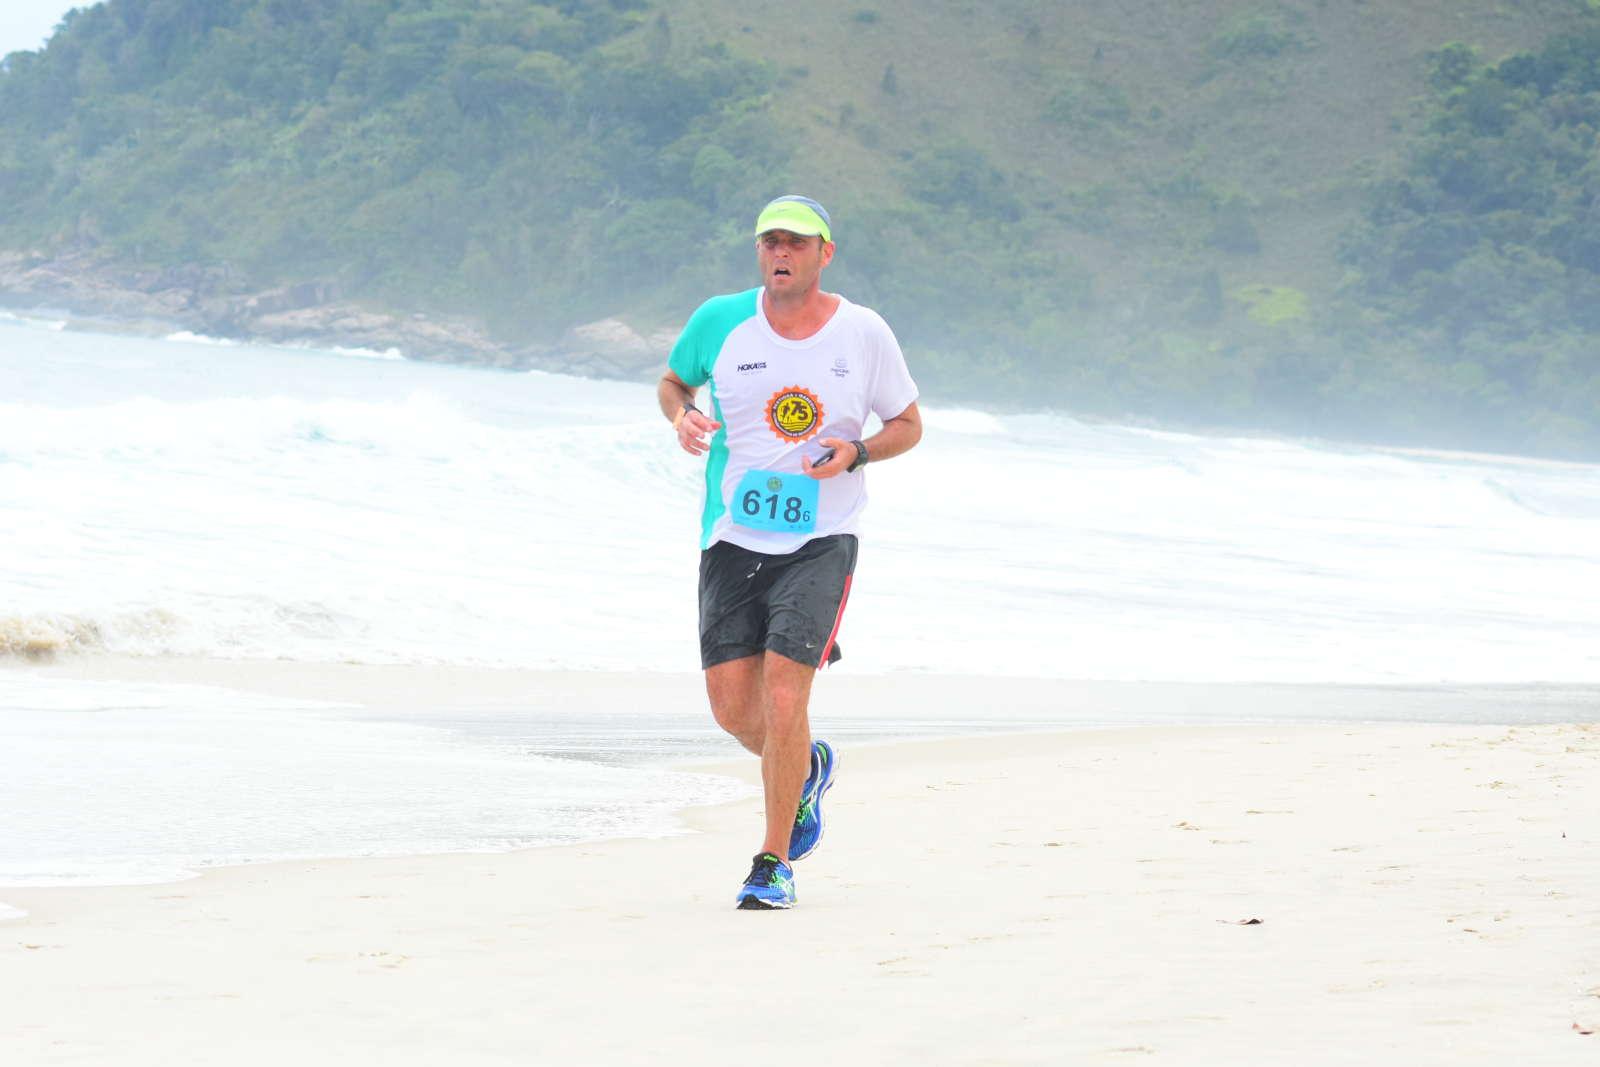 Maratona de revezamento de Bertioga